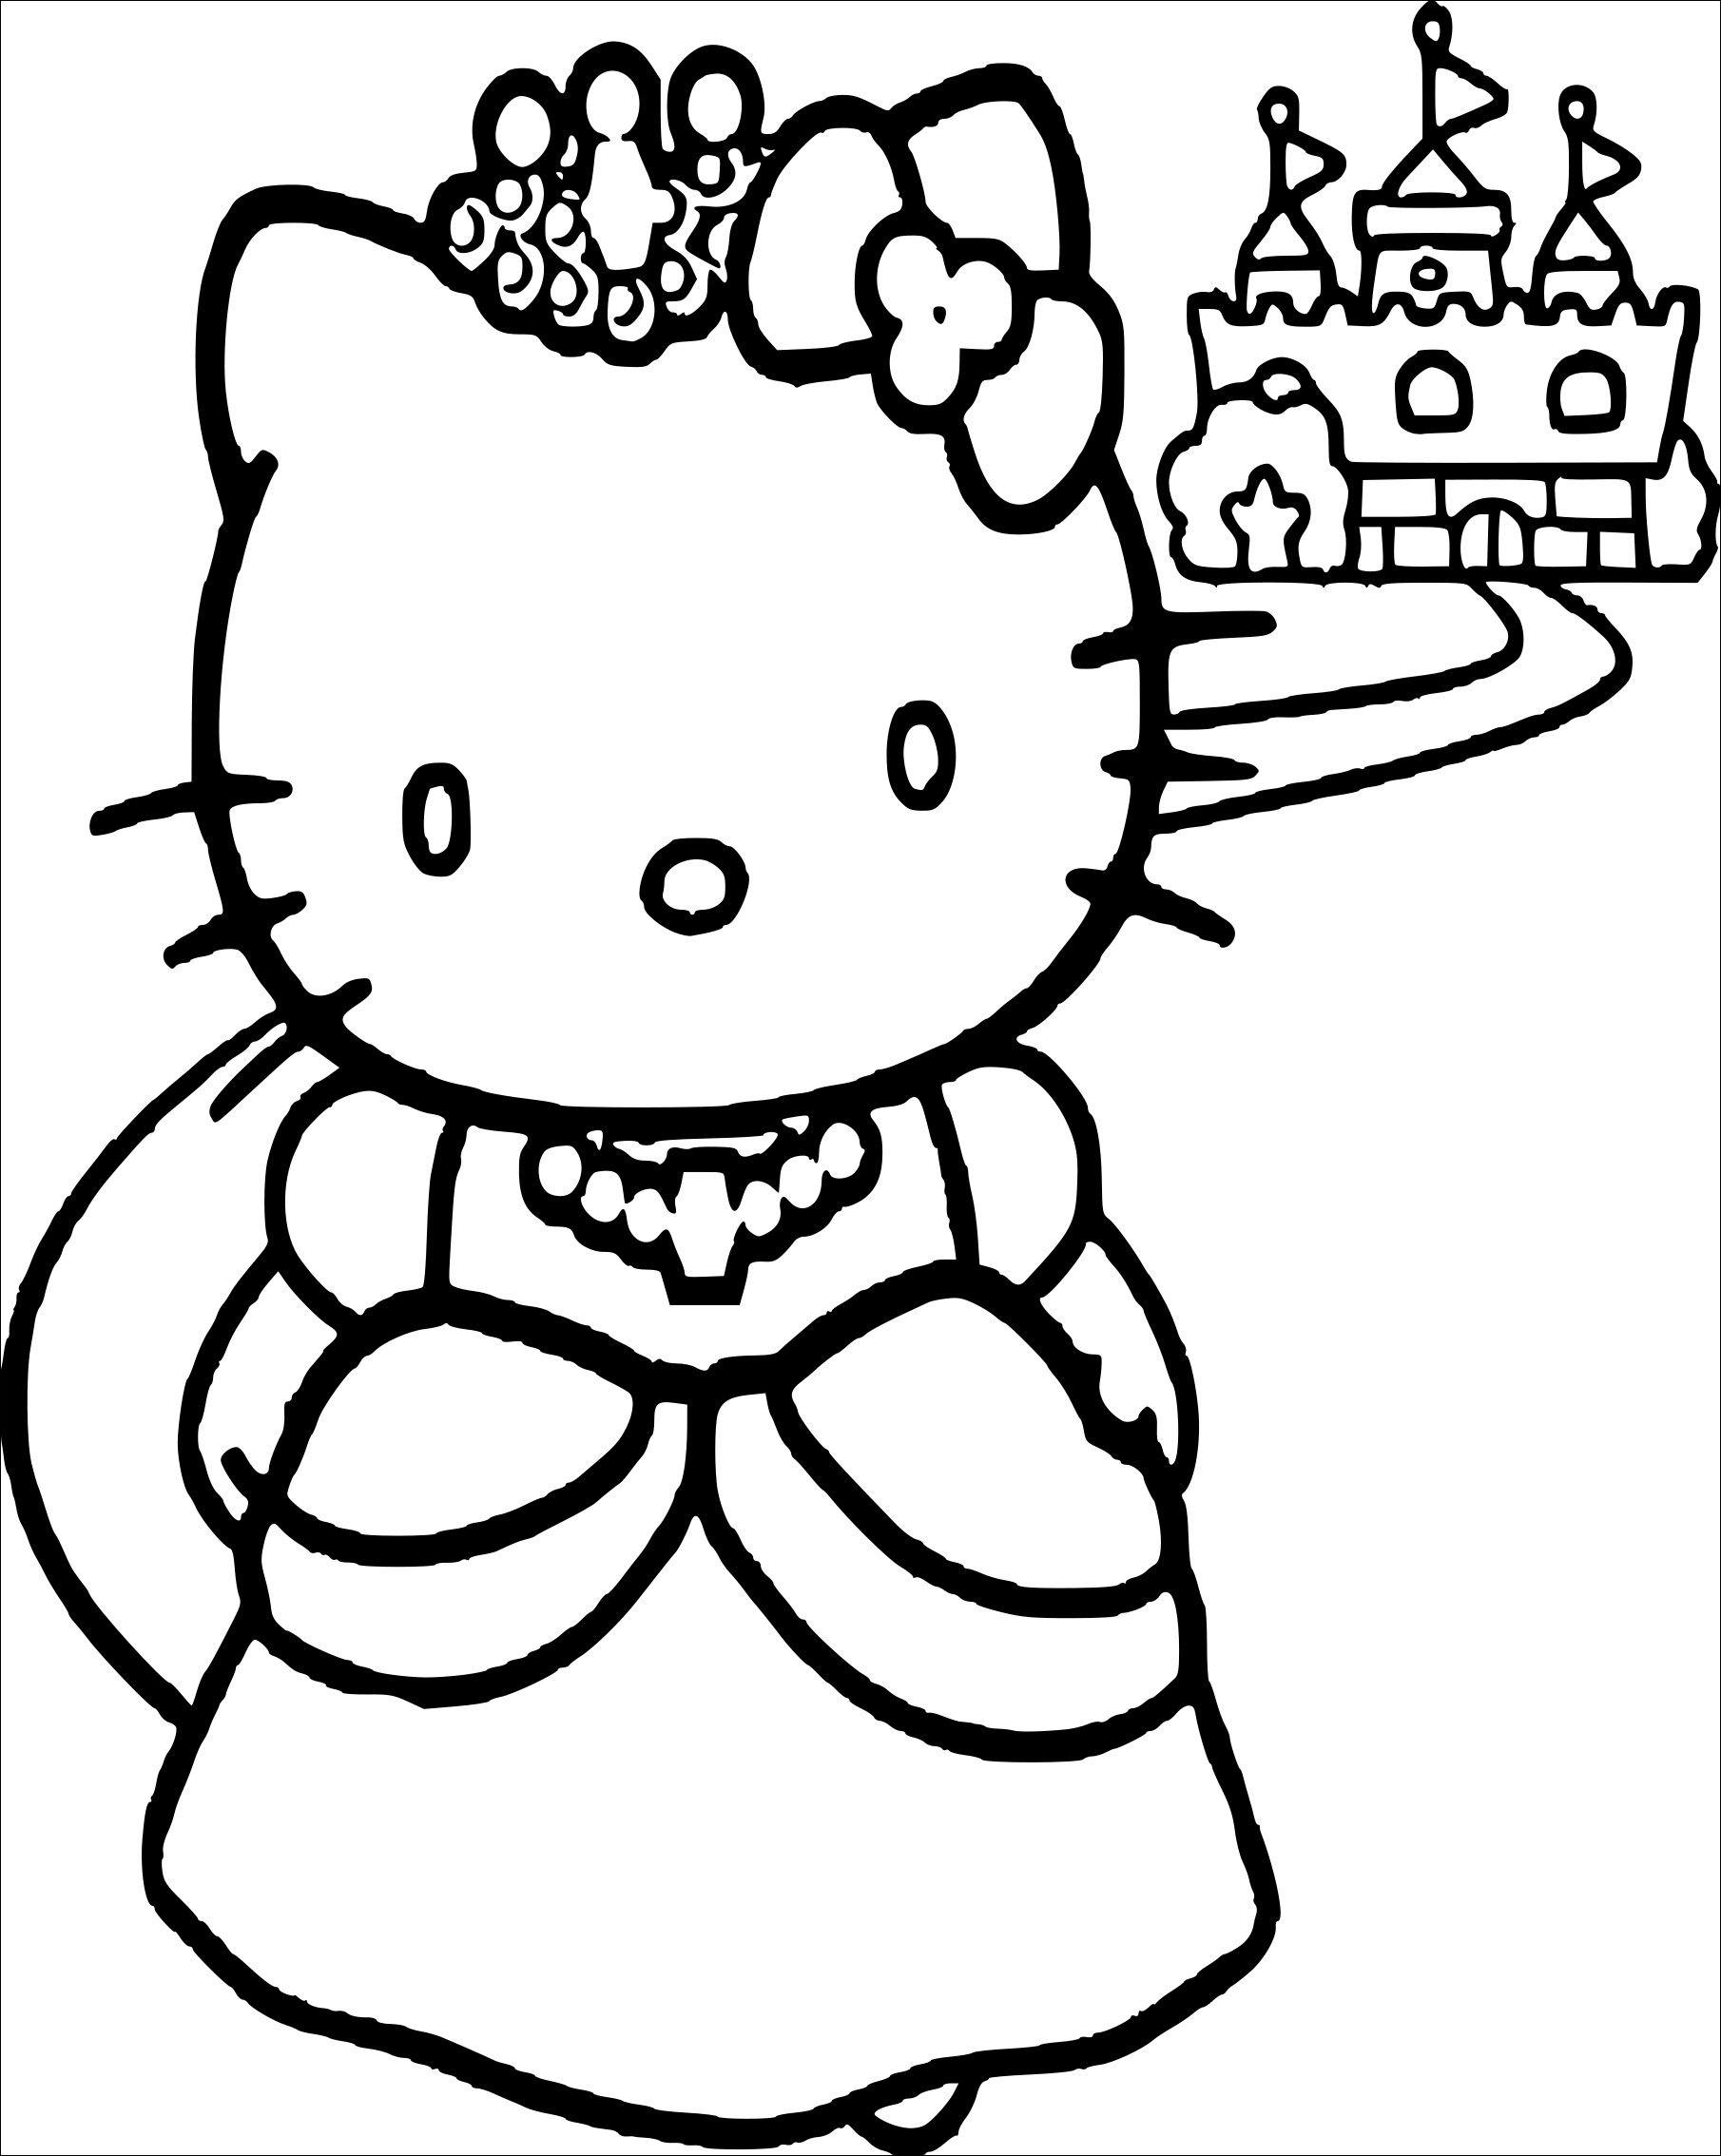 17 Magnifique Dessin A Imprimer Hello Kitty Images